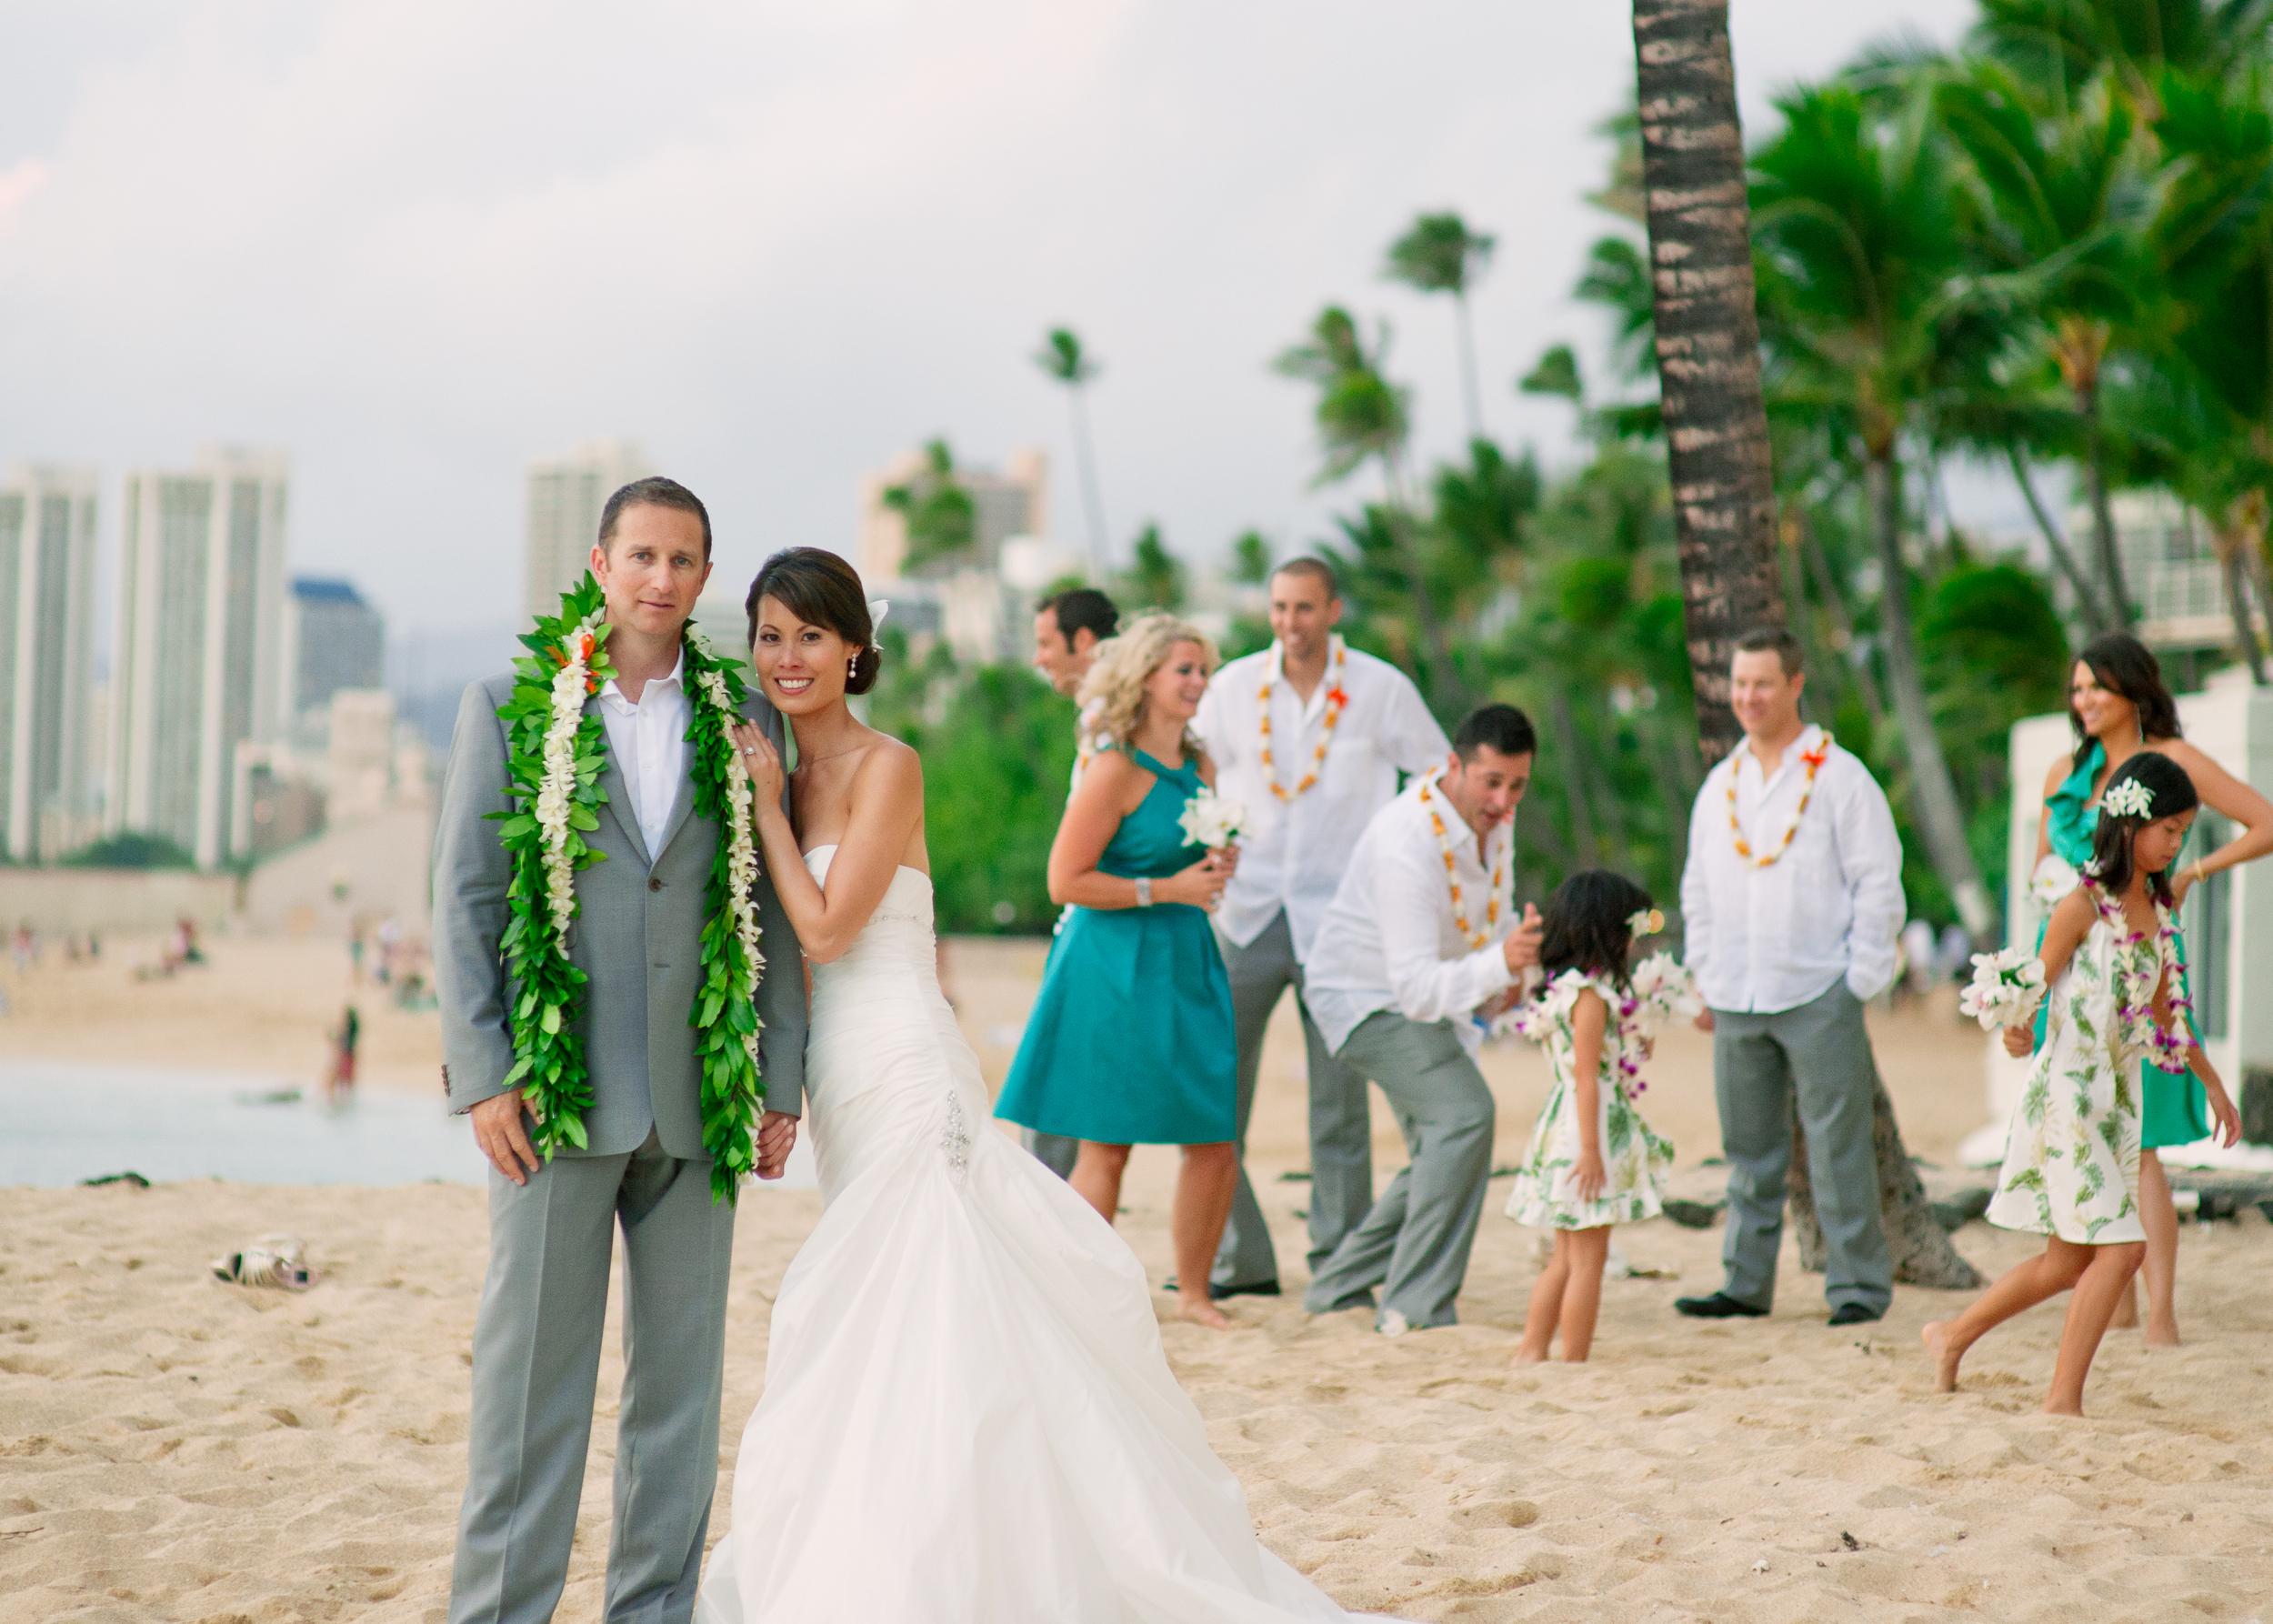 seattle-wedding-photographer-11-2.jpg